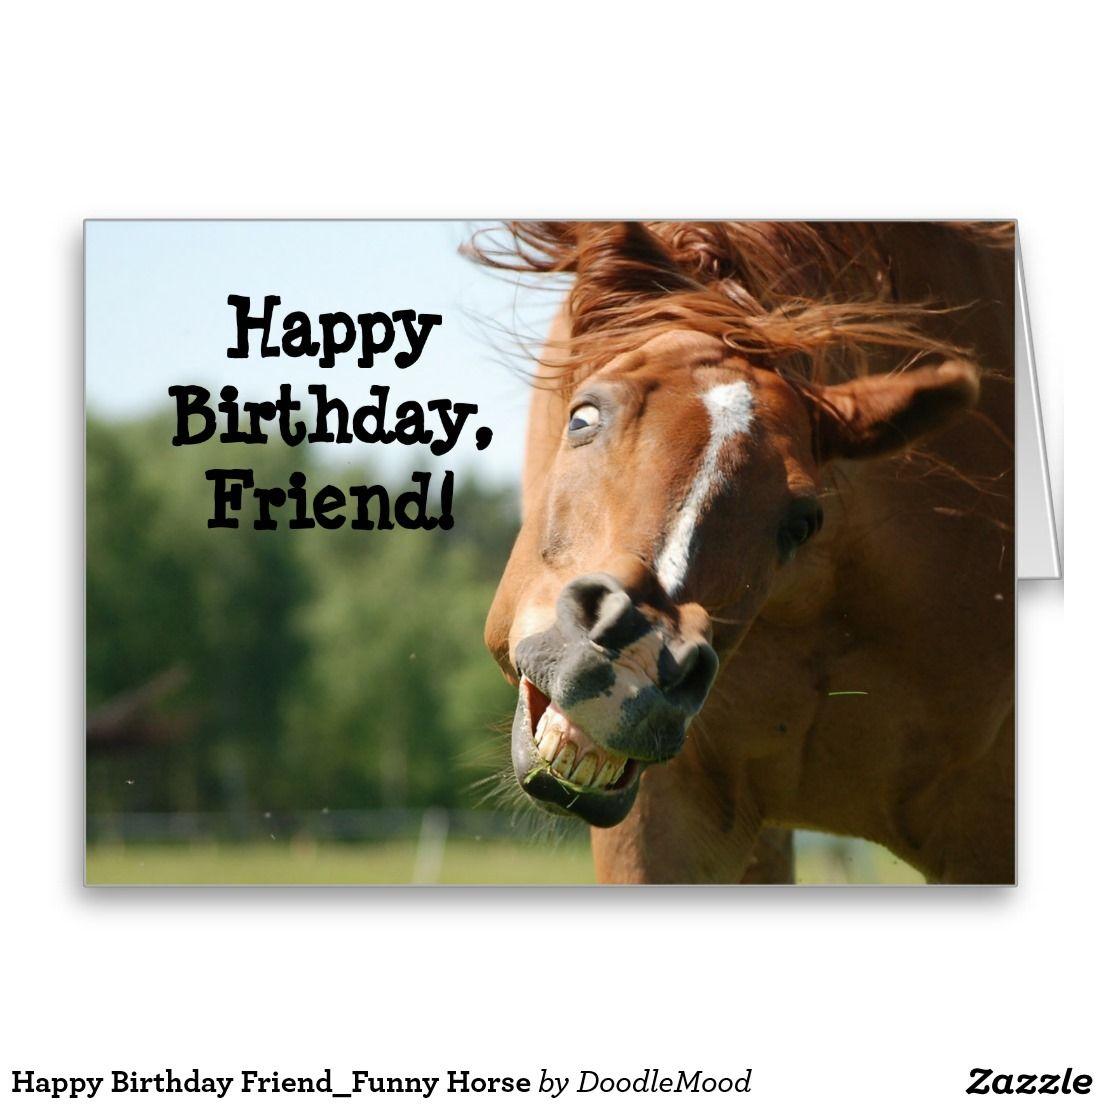 Funny Happy Birthday Cards Funny E Cards Pic Has Horses Cartoon Birthday Card With Fun Funny Happy Birthday Wishes Birthday Wishes Funny Happy Birthday Funny